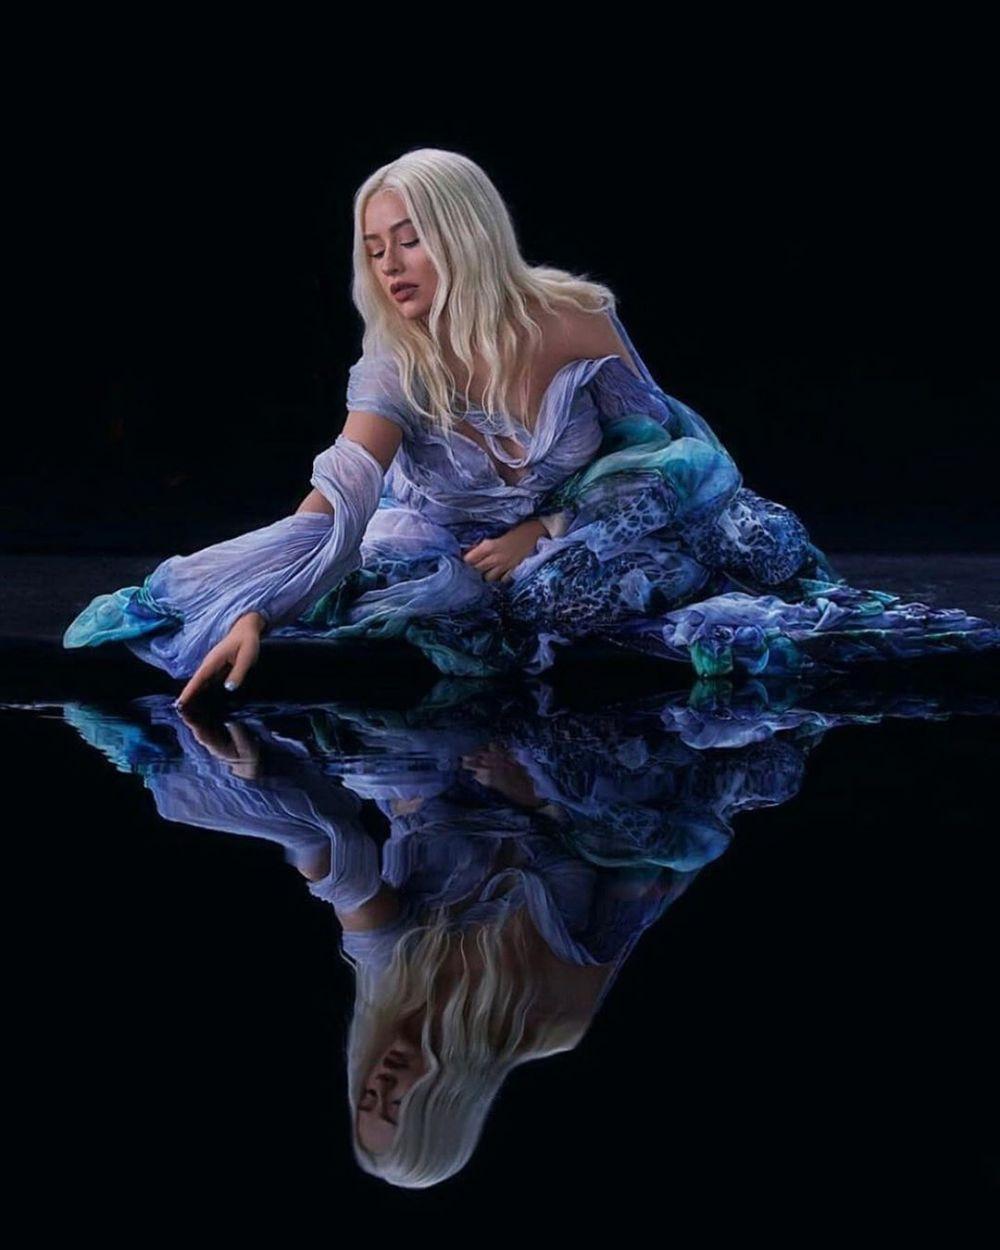 9 Fakta Iris van Herpen, Perancang Busana di MV Reflection OST Mulan